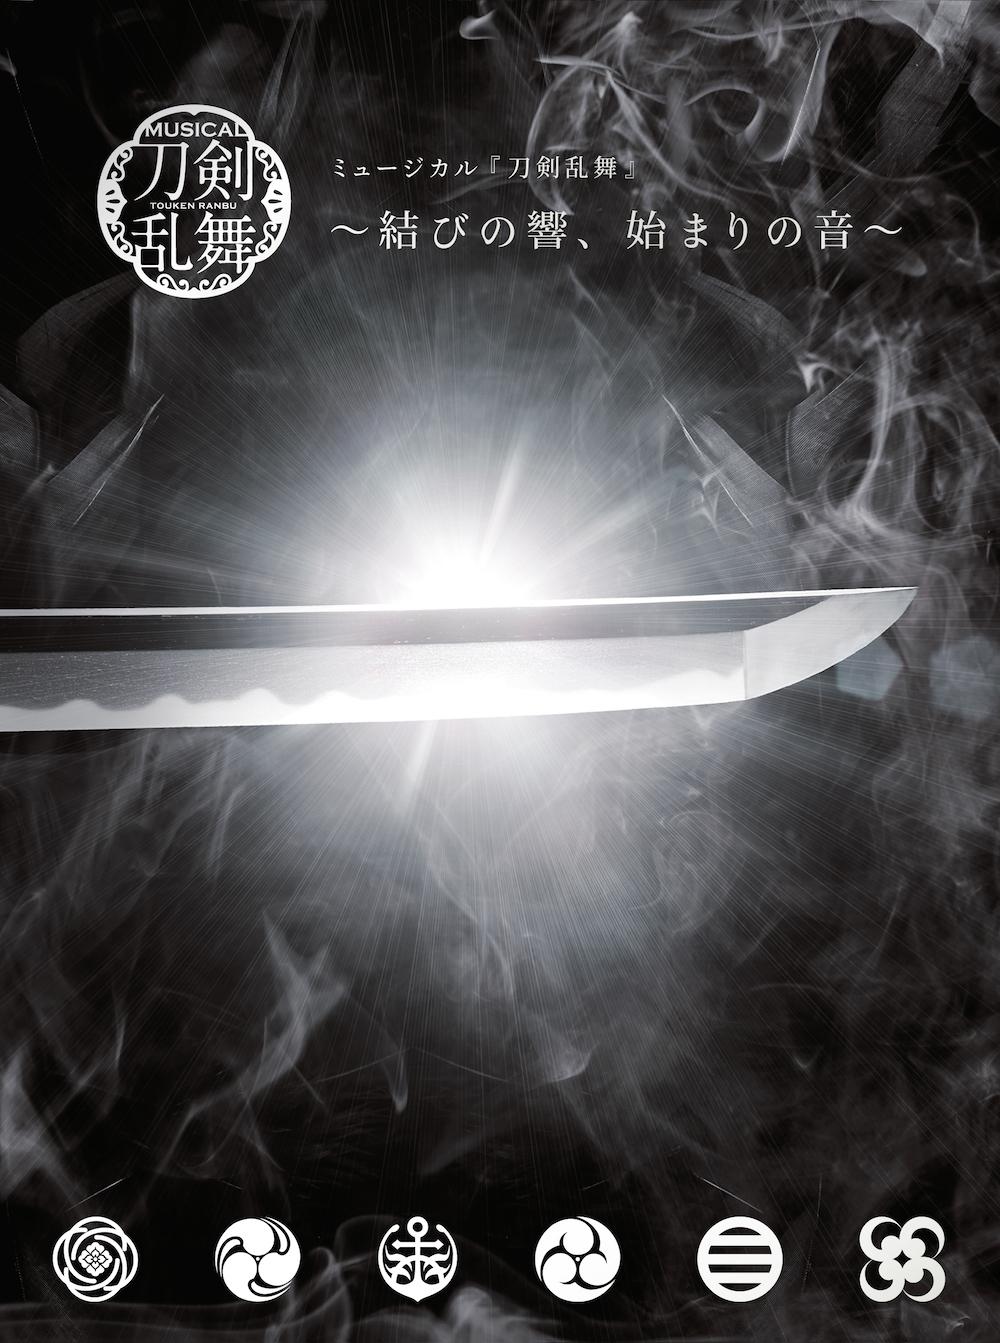 5thアルバム ミュージカル『刀剣乱舞』 ~結びの響、始まりの音~ 初回限定盤A